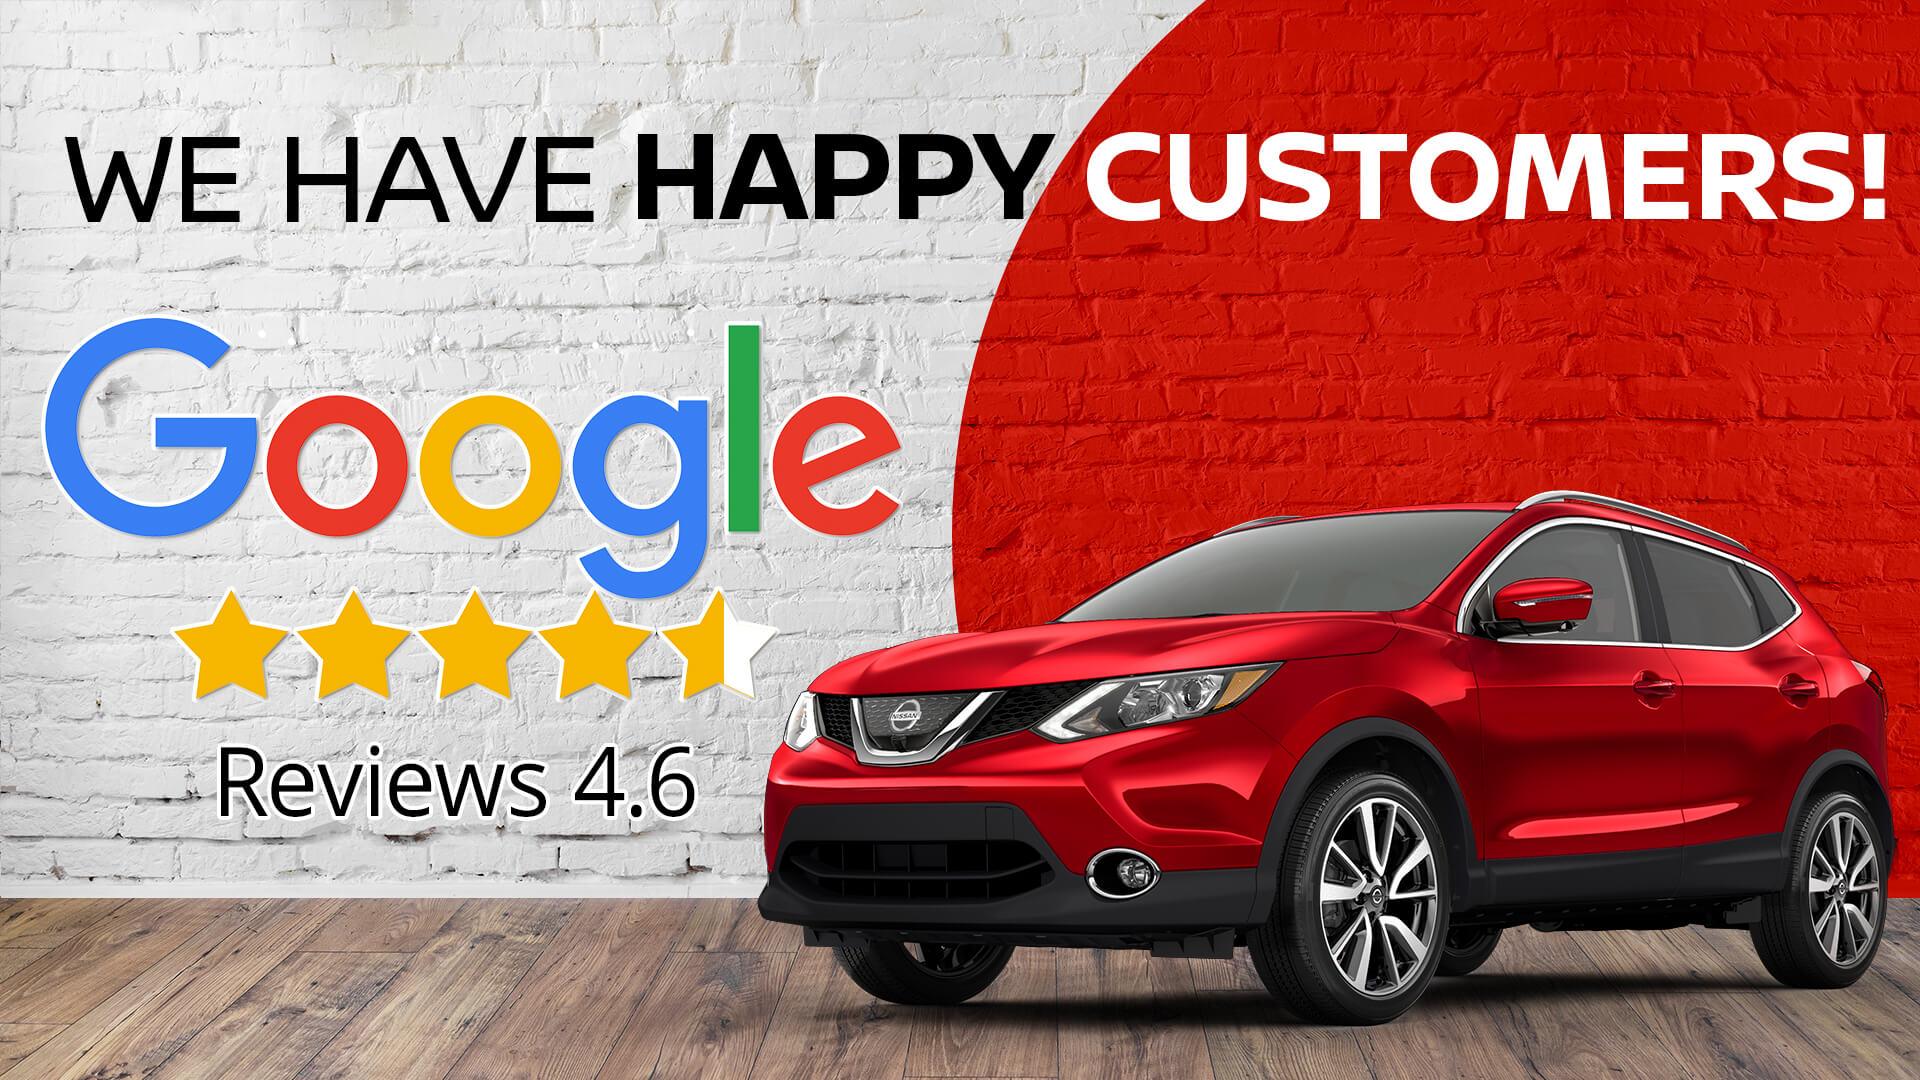 Happy Customers Google